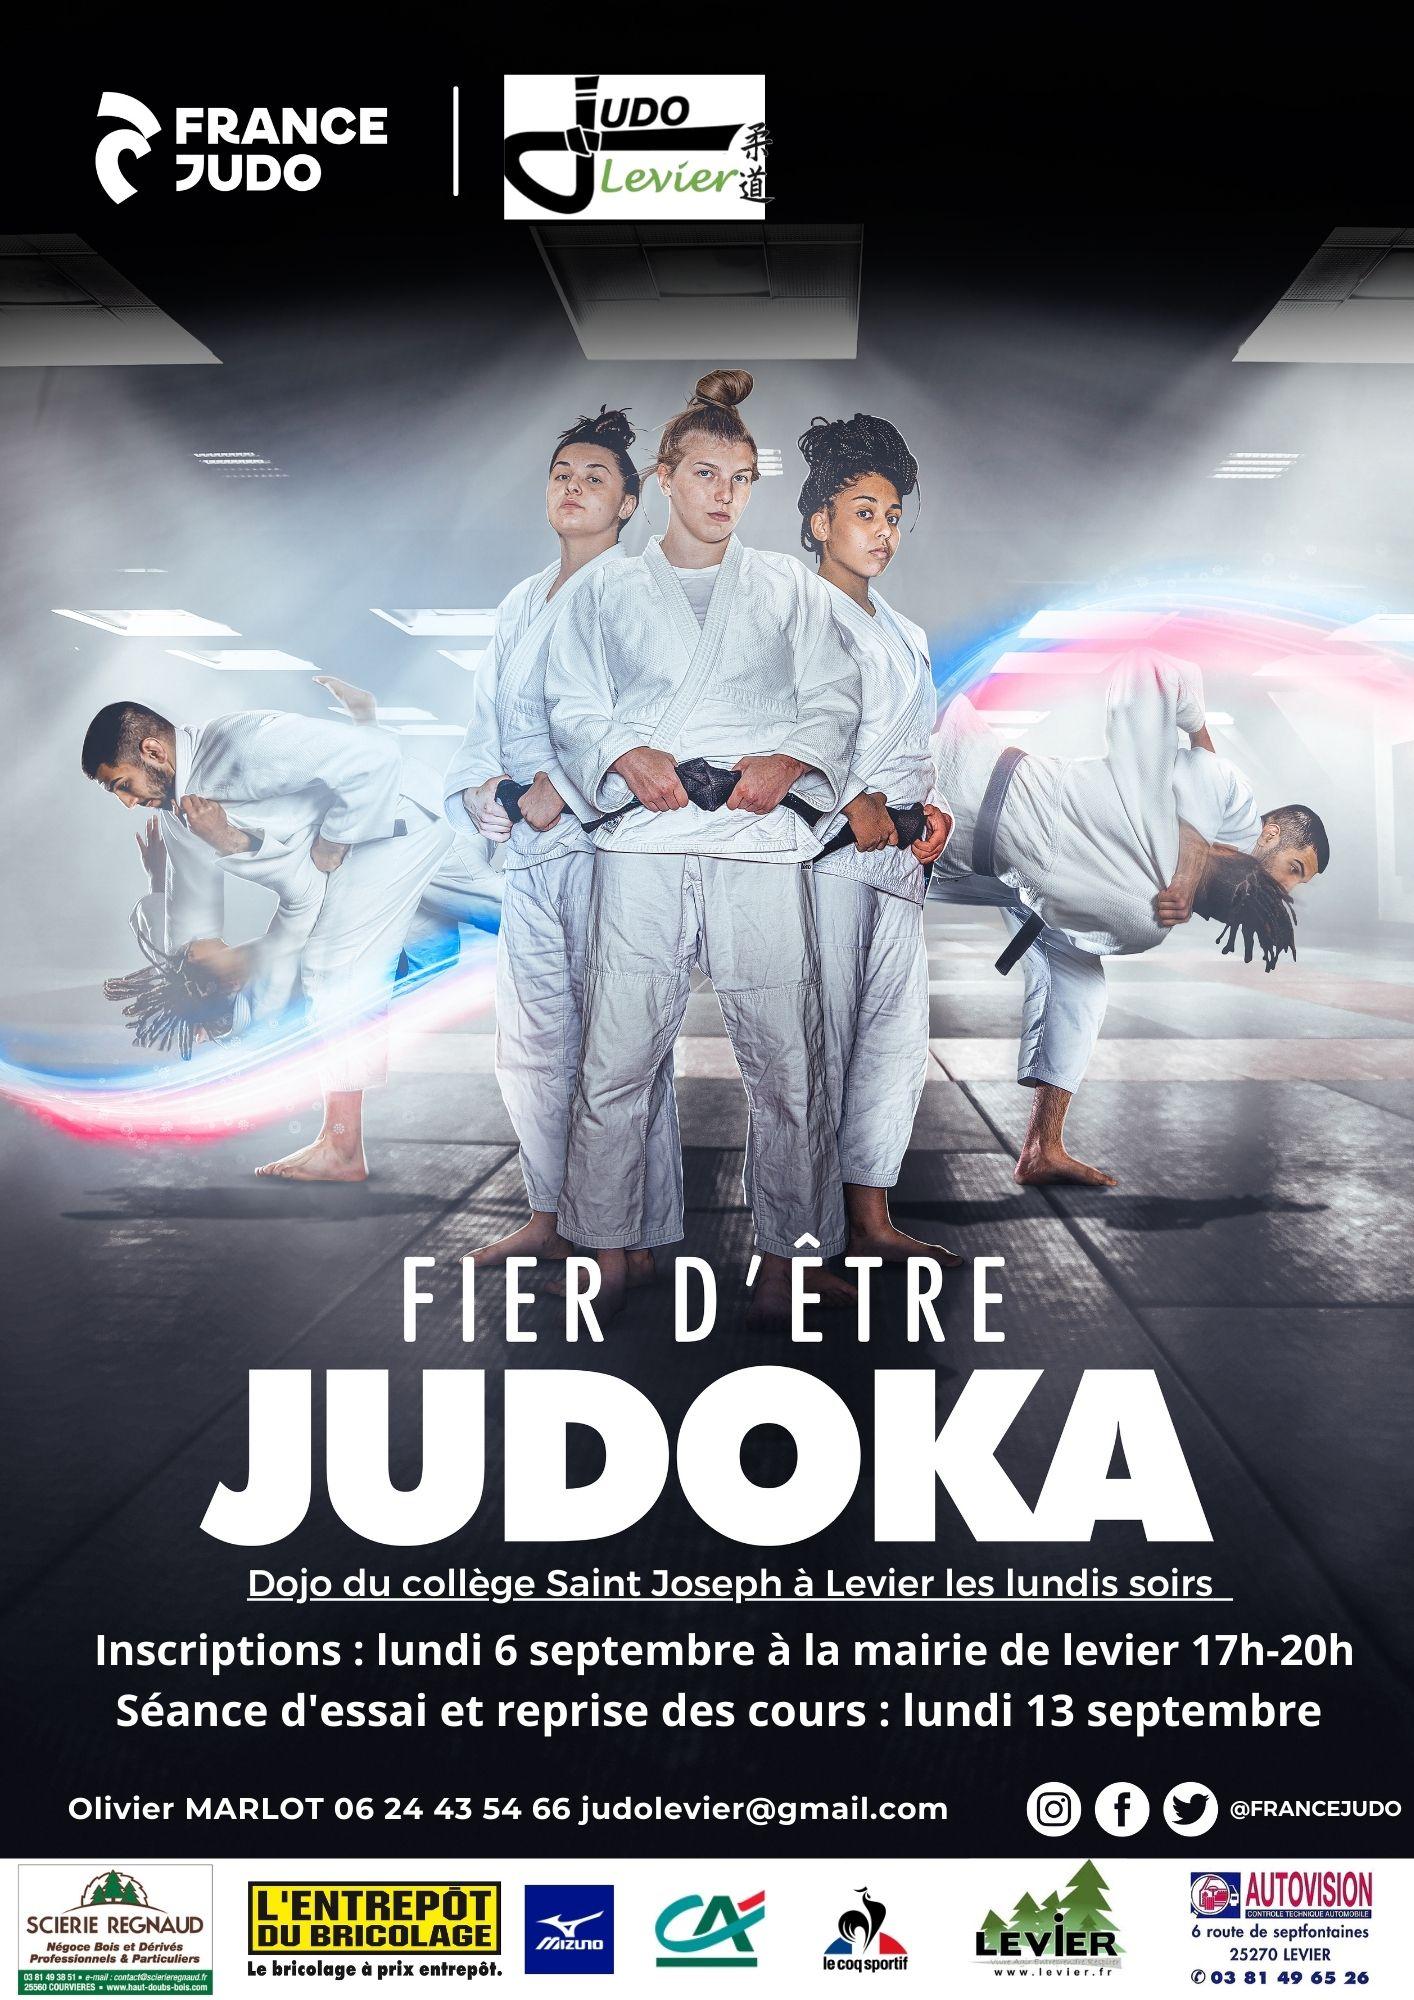 Fier d_être judoka.jpg